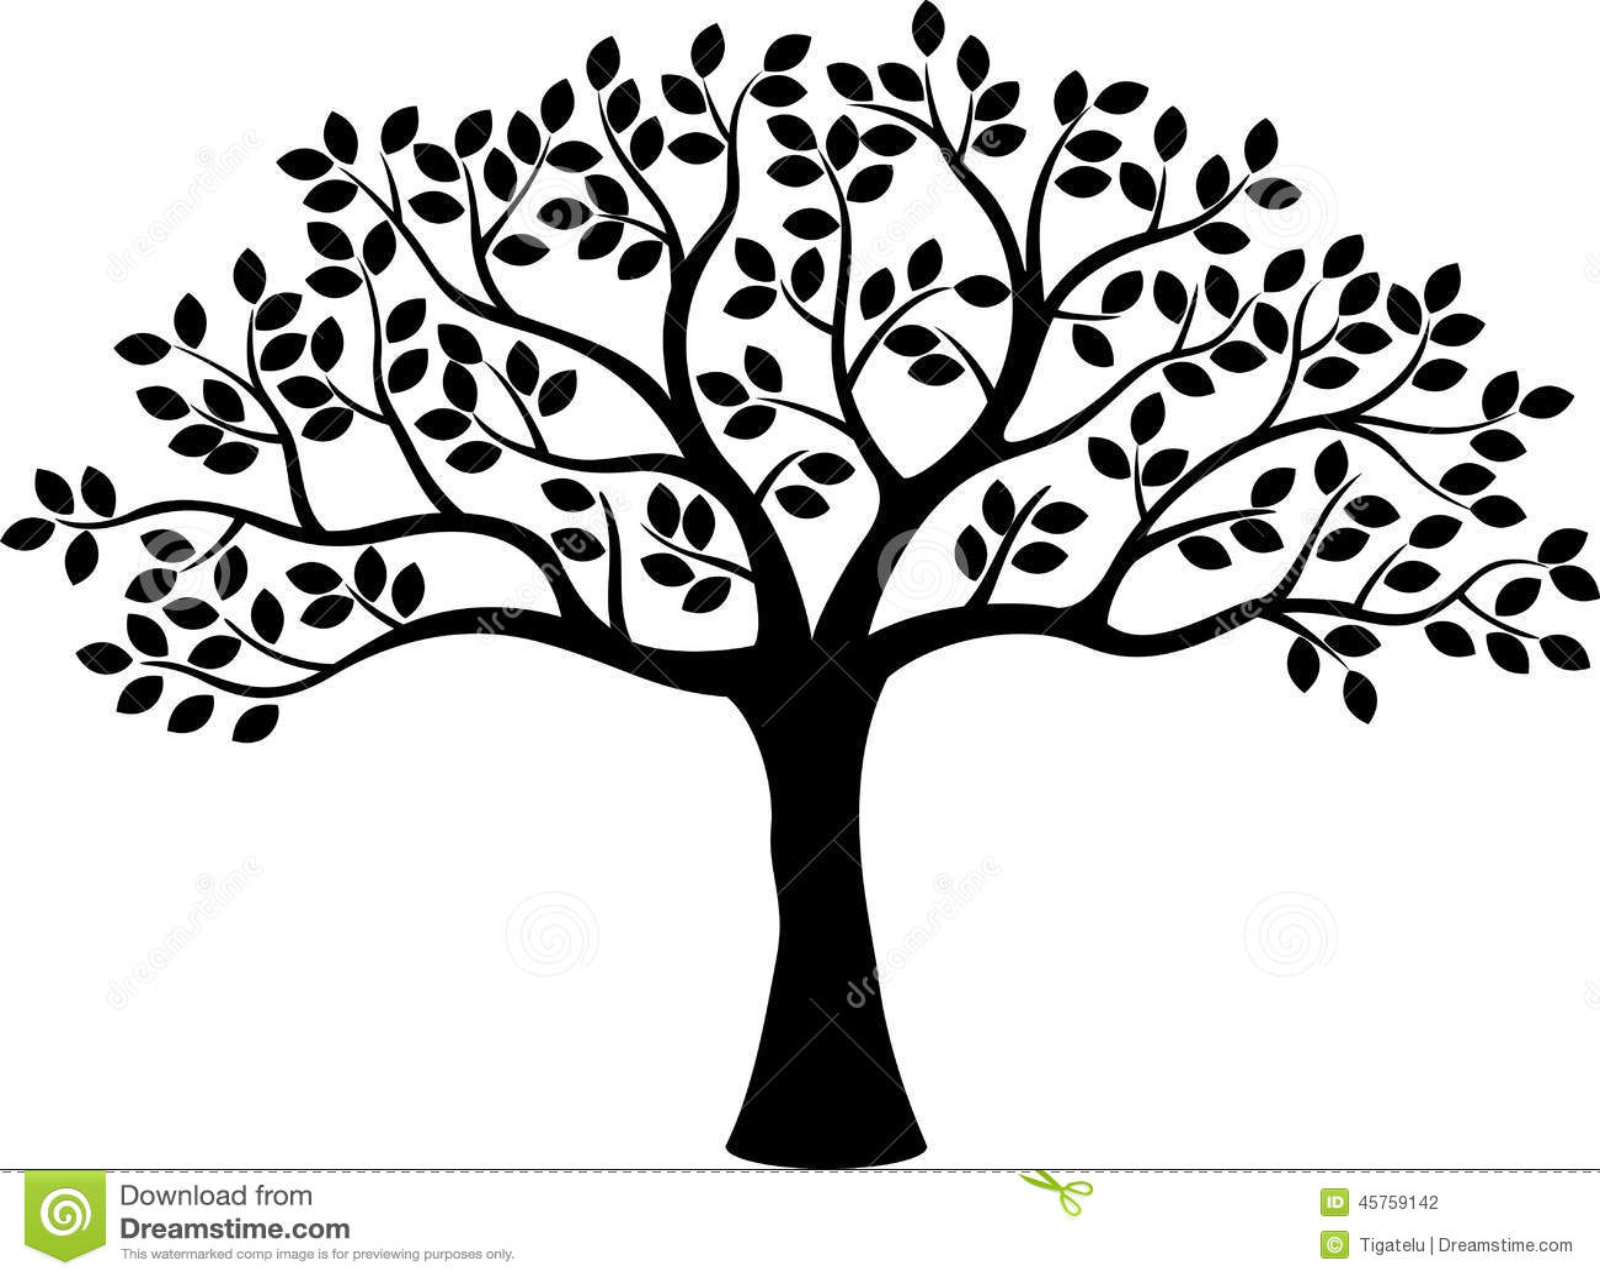 Tree Silhouette Cartoon Stock Vector Illustration Of Grunge